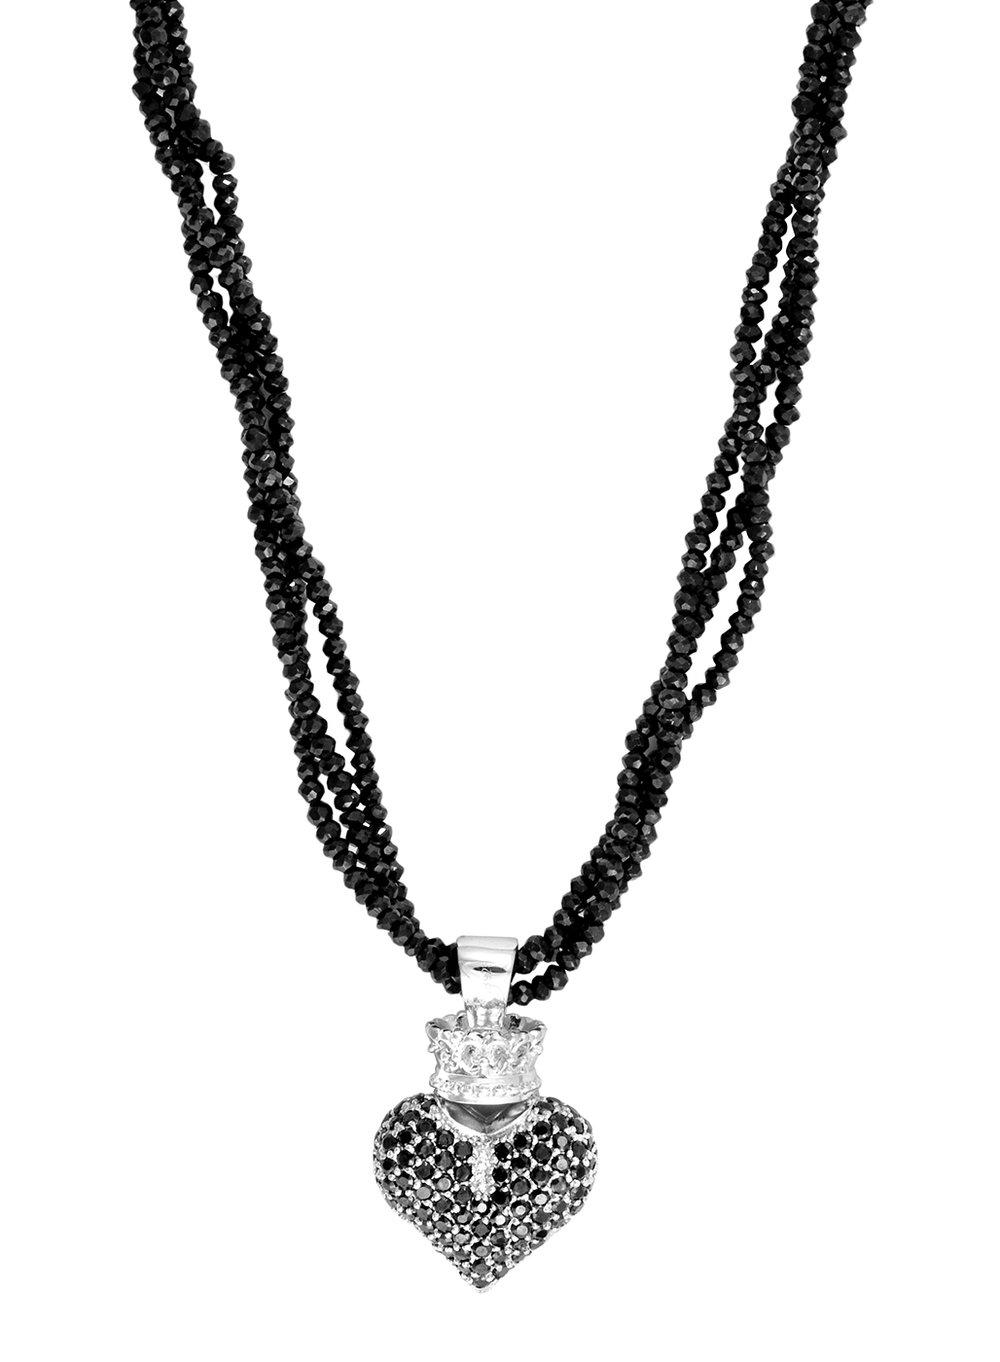 Pave black spinel 925 Sterling Silver natural gemstone black charms Pendant pave jewelry HEART Pendant pave black diamond 25 mmx 22 mm E-344